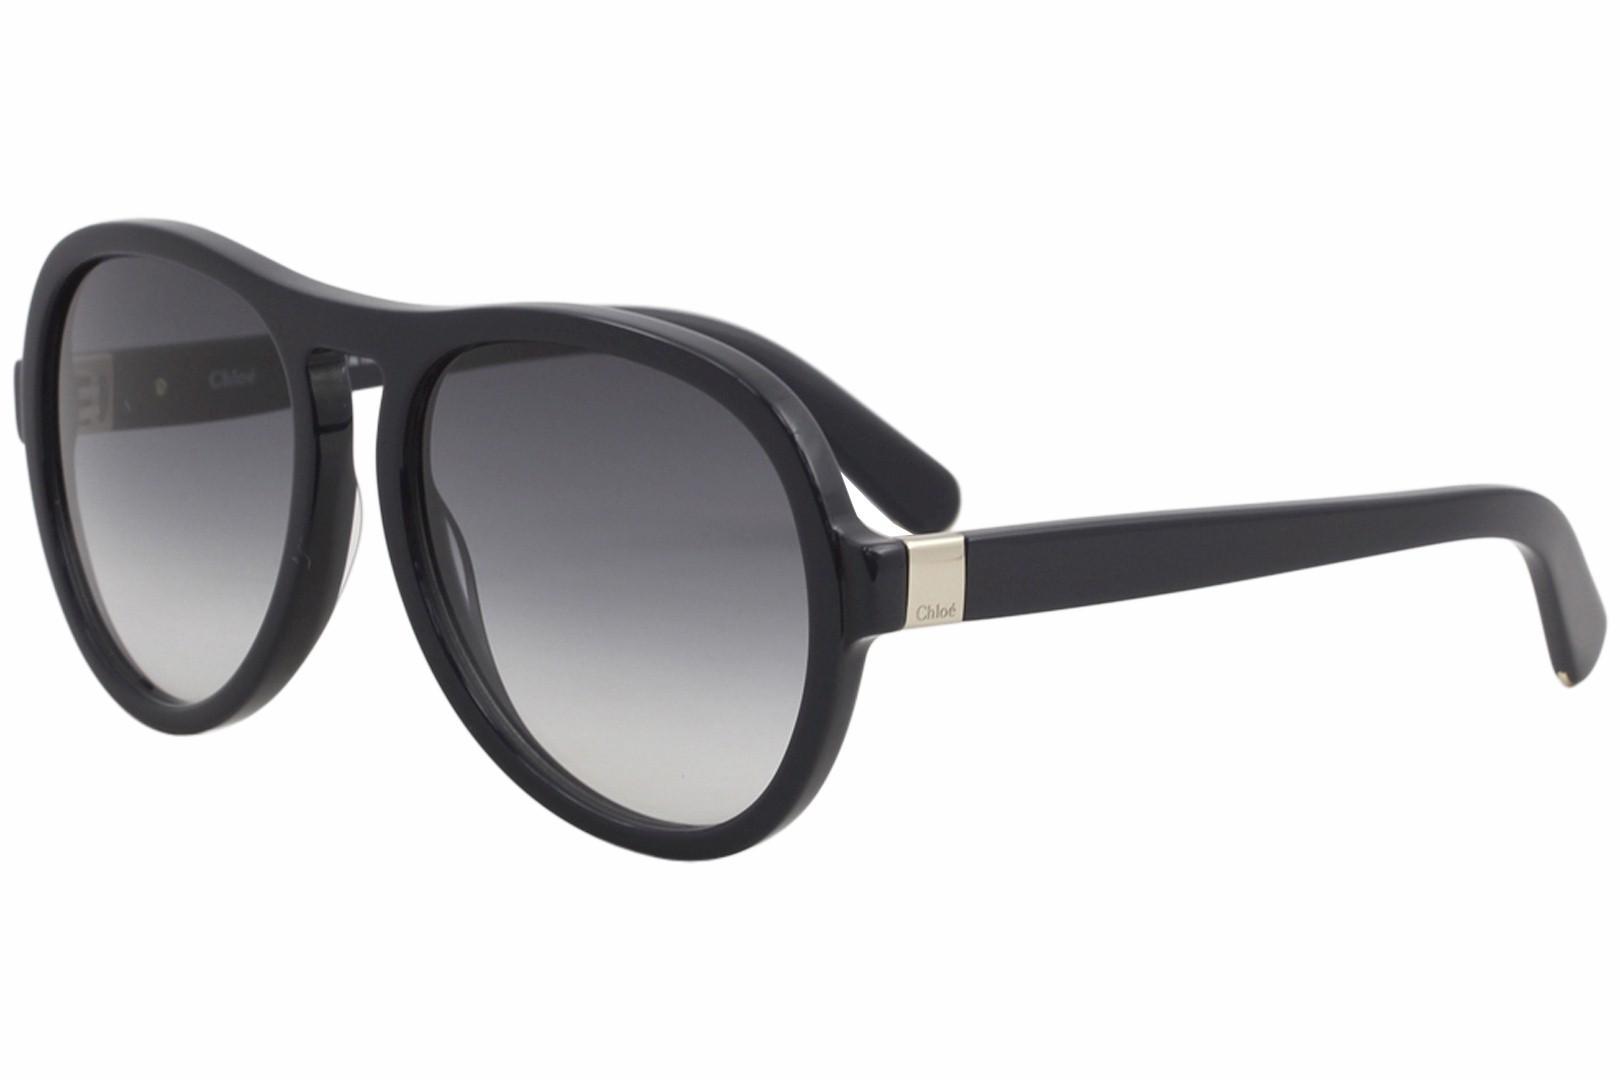 34dfb3aa93c Chloe Women s CE716S CE 716 S Fashion Pilot Sunglasses. Price   139.95 · Chloe  Women s 109SL 109 SL Square Sunglasses